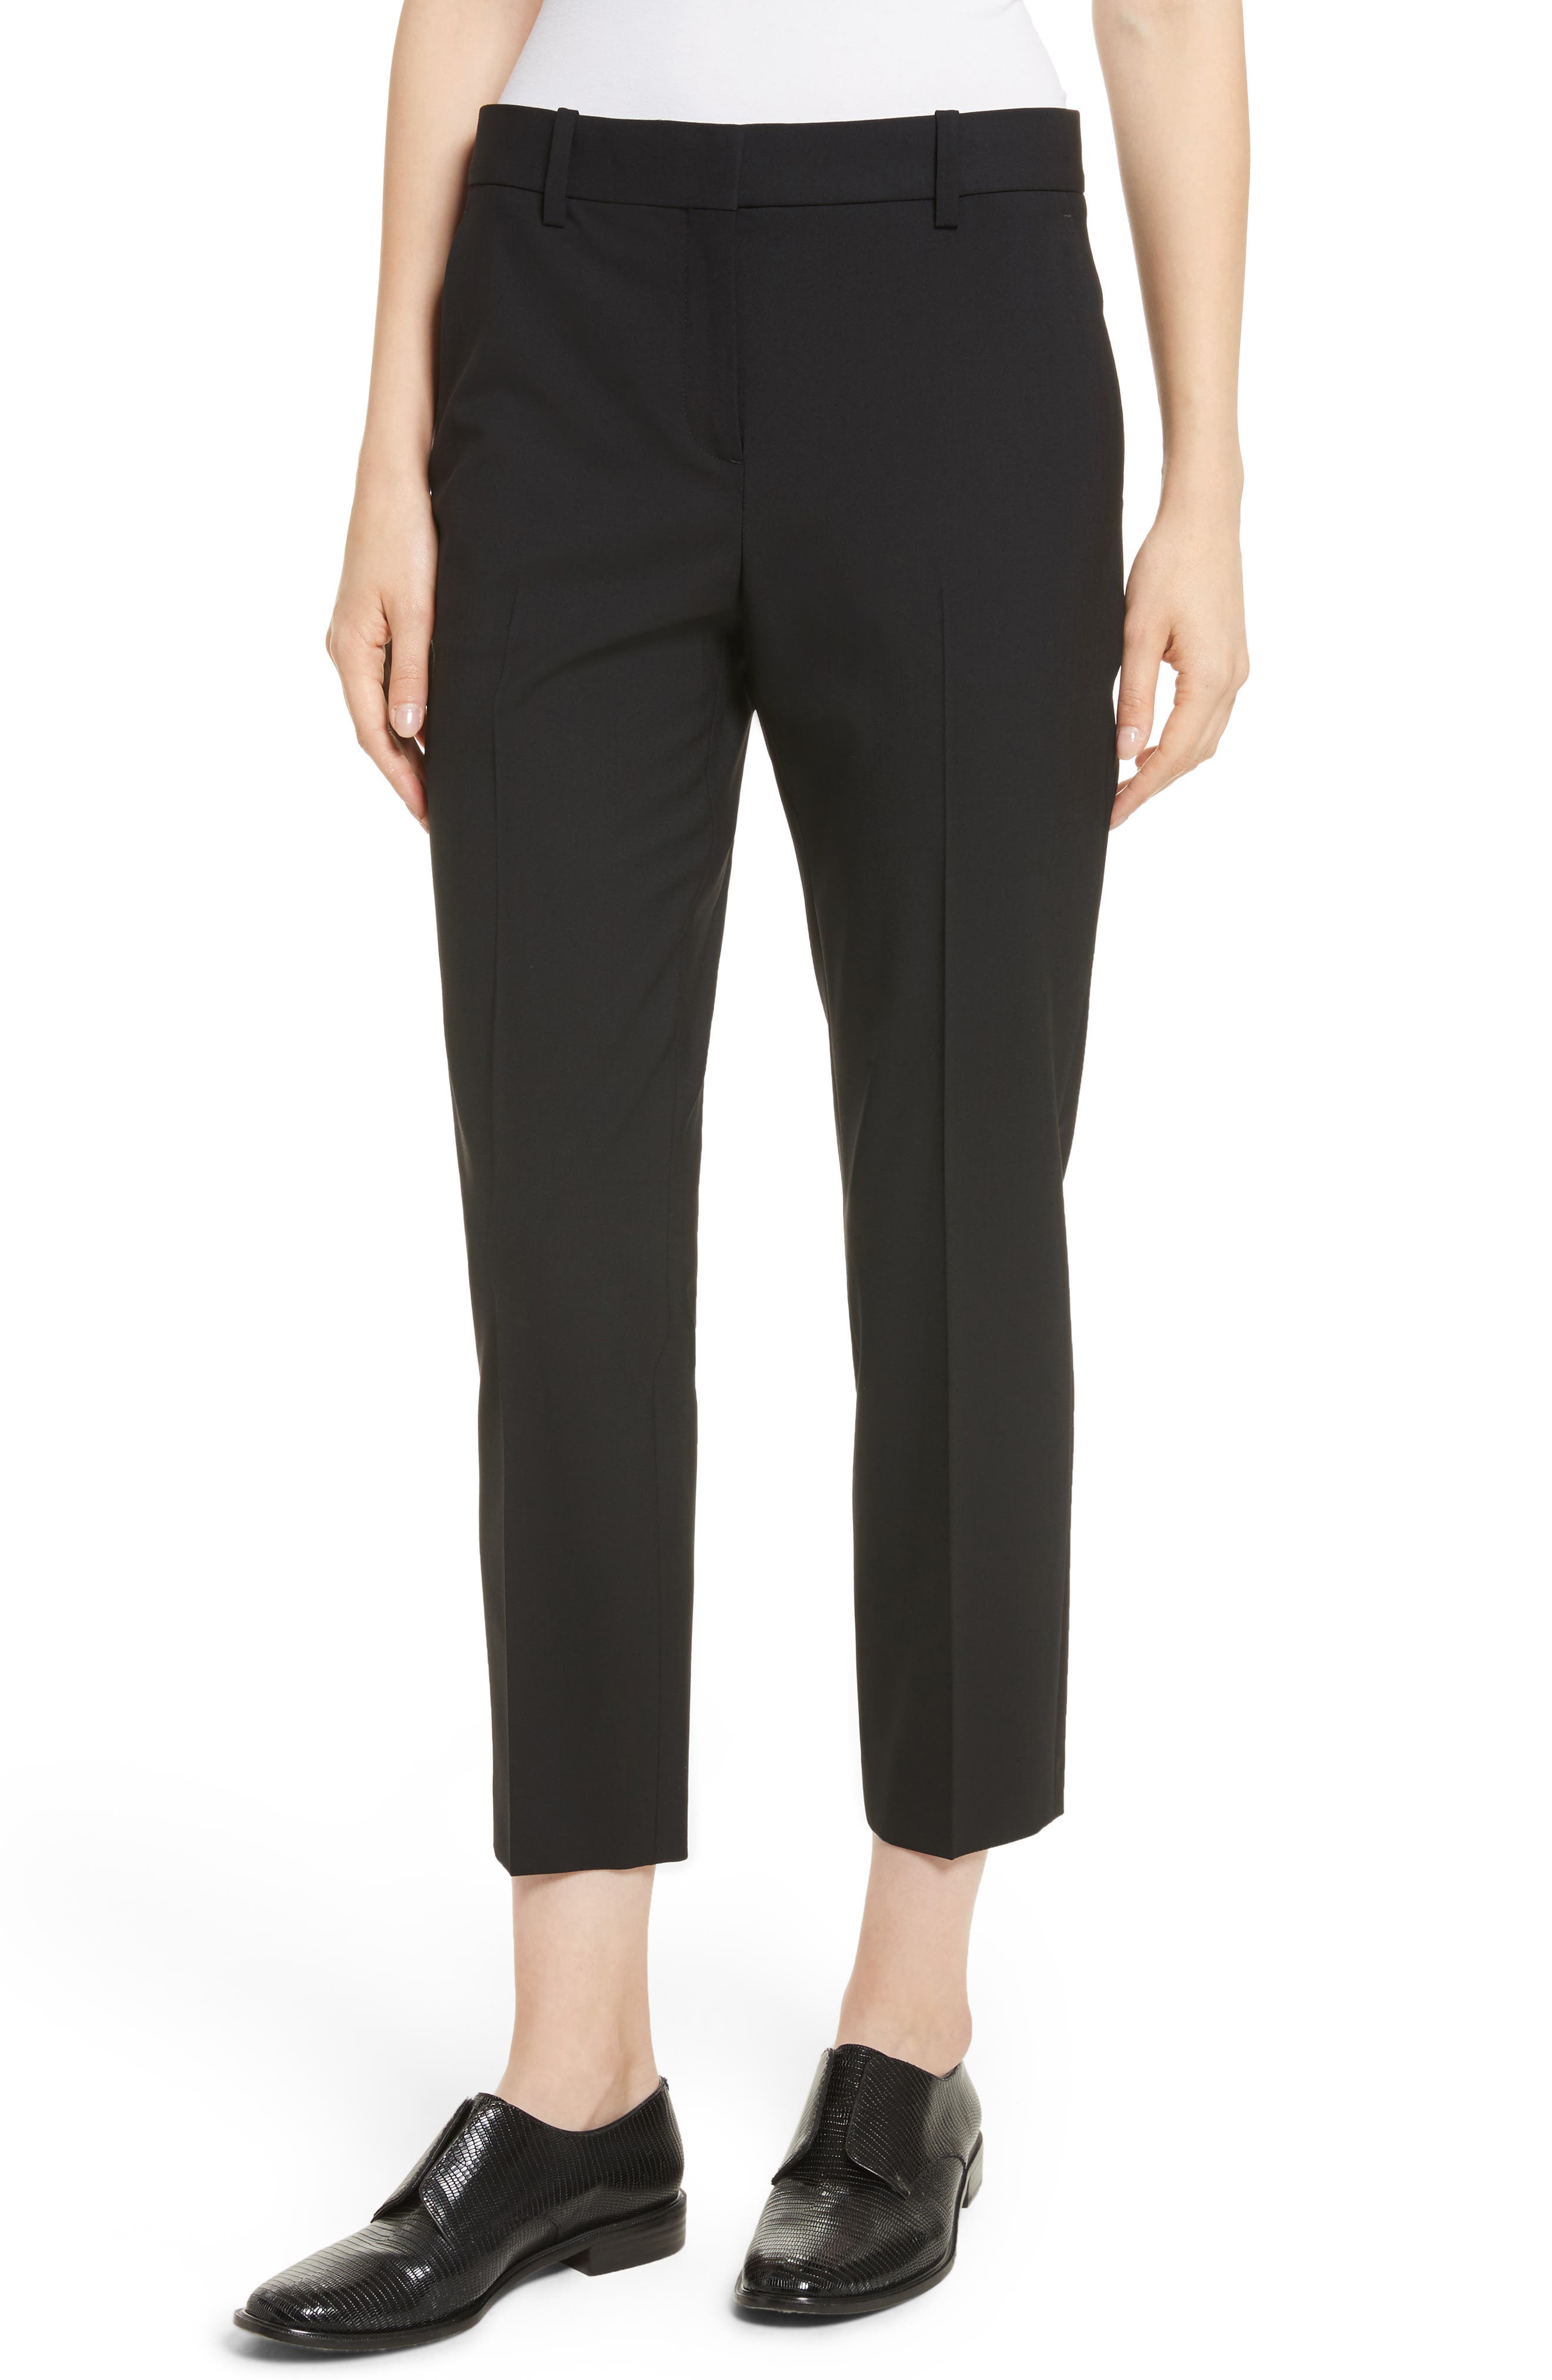 Treeca 2 Good Wool Crop Suit Pants,                             Main thumbnail 1, color,                             BLACK